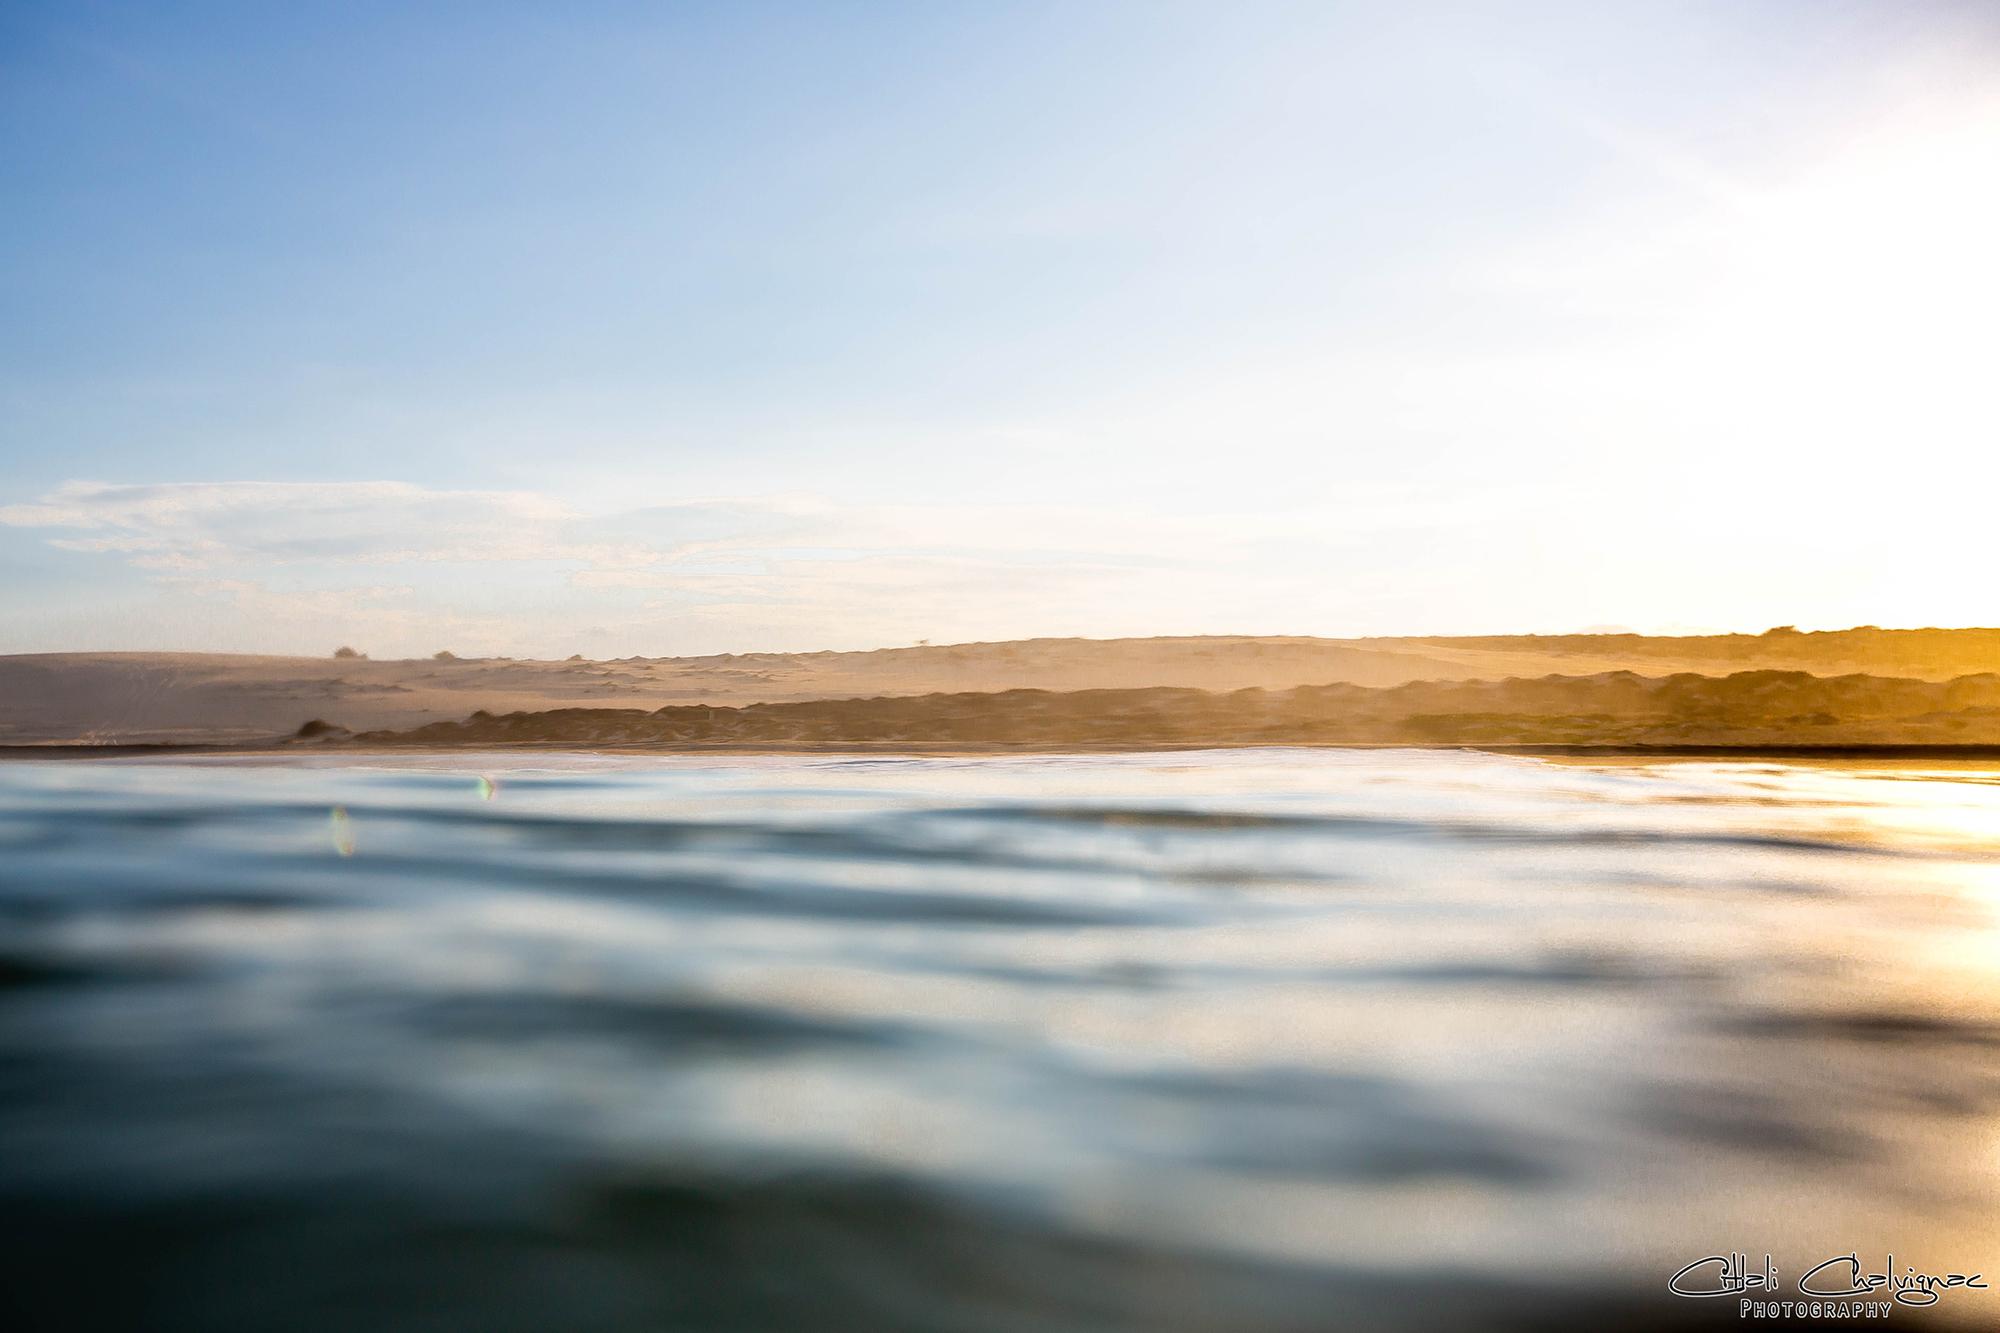 Galeria Ocean imagen 8 Citlali Chalvignac